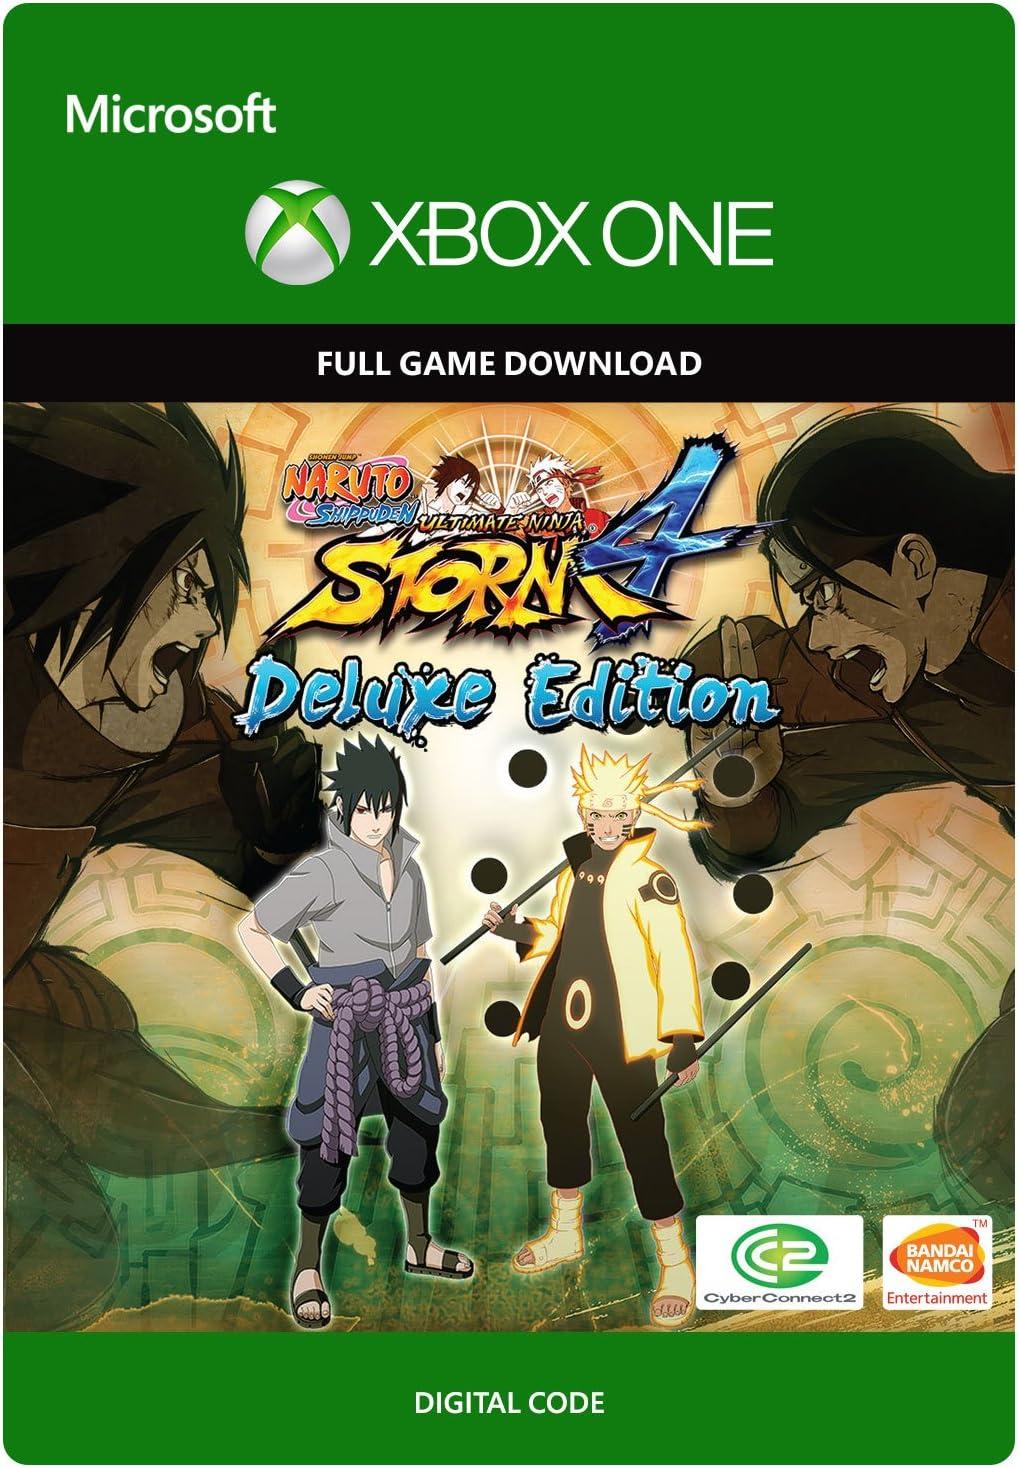 Amazon.com: Naruto Ultimate Ninja Storm 4 - Deluxe Edition ...